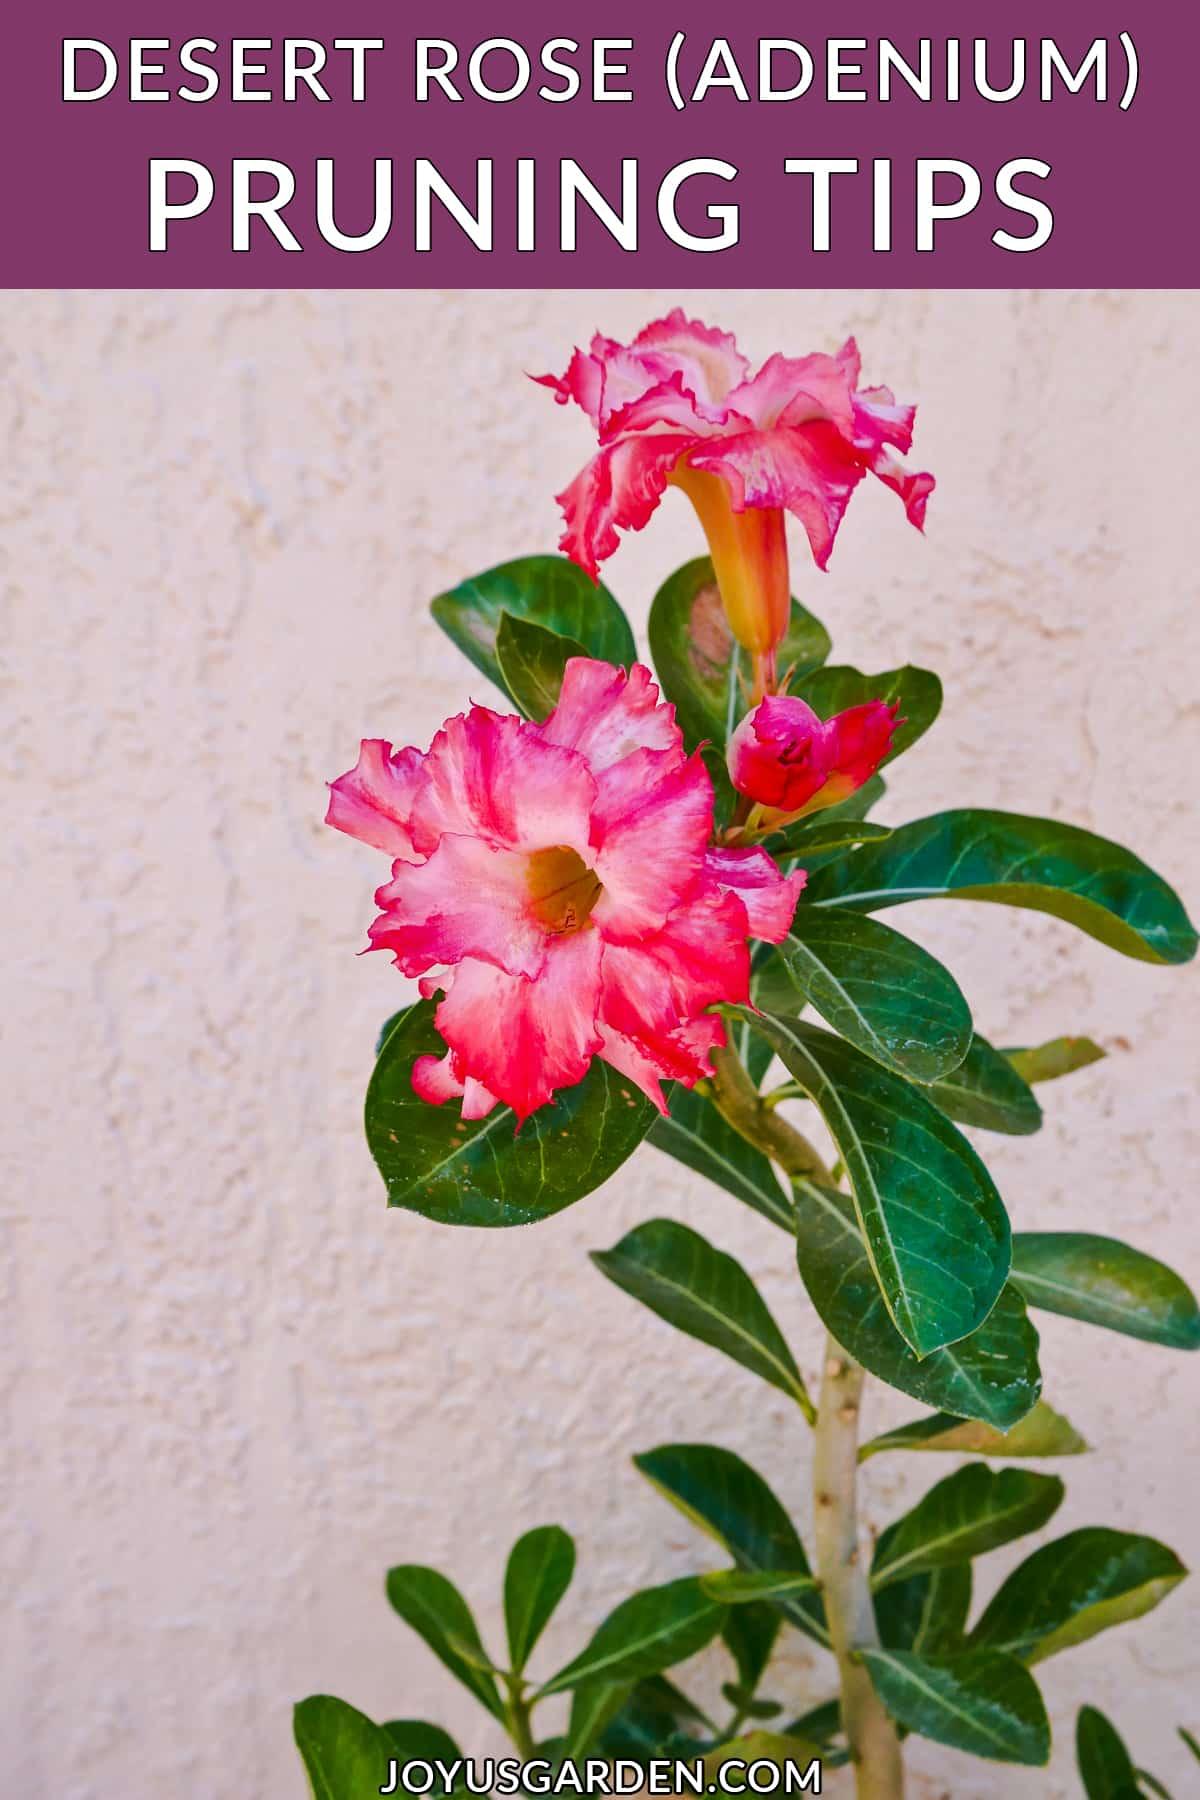 close up of the dark pink/white flowers of an adenium desert rose the text reads desert rose (adenium) pruning tips